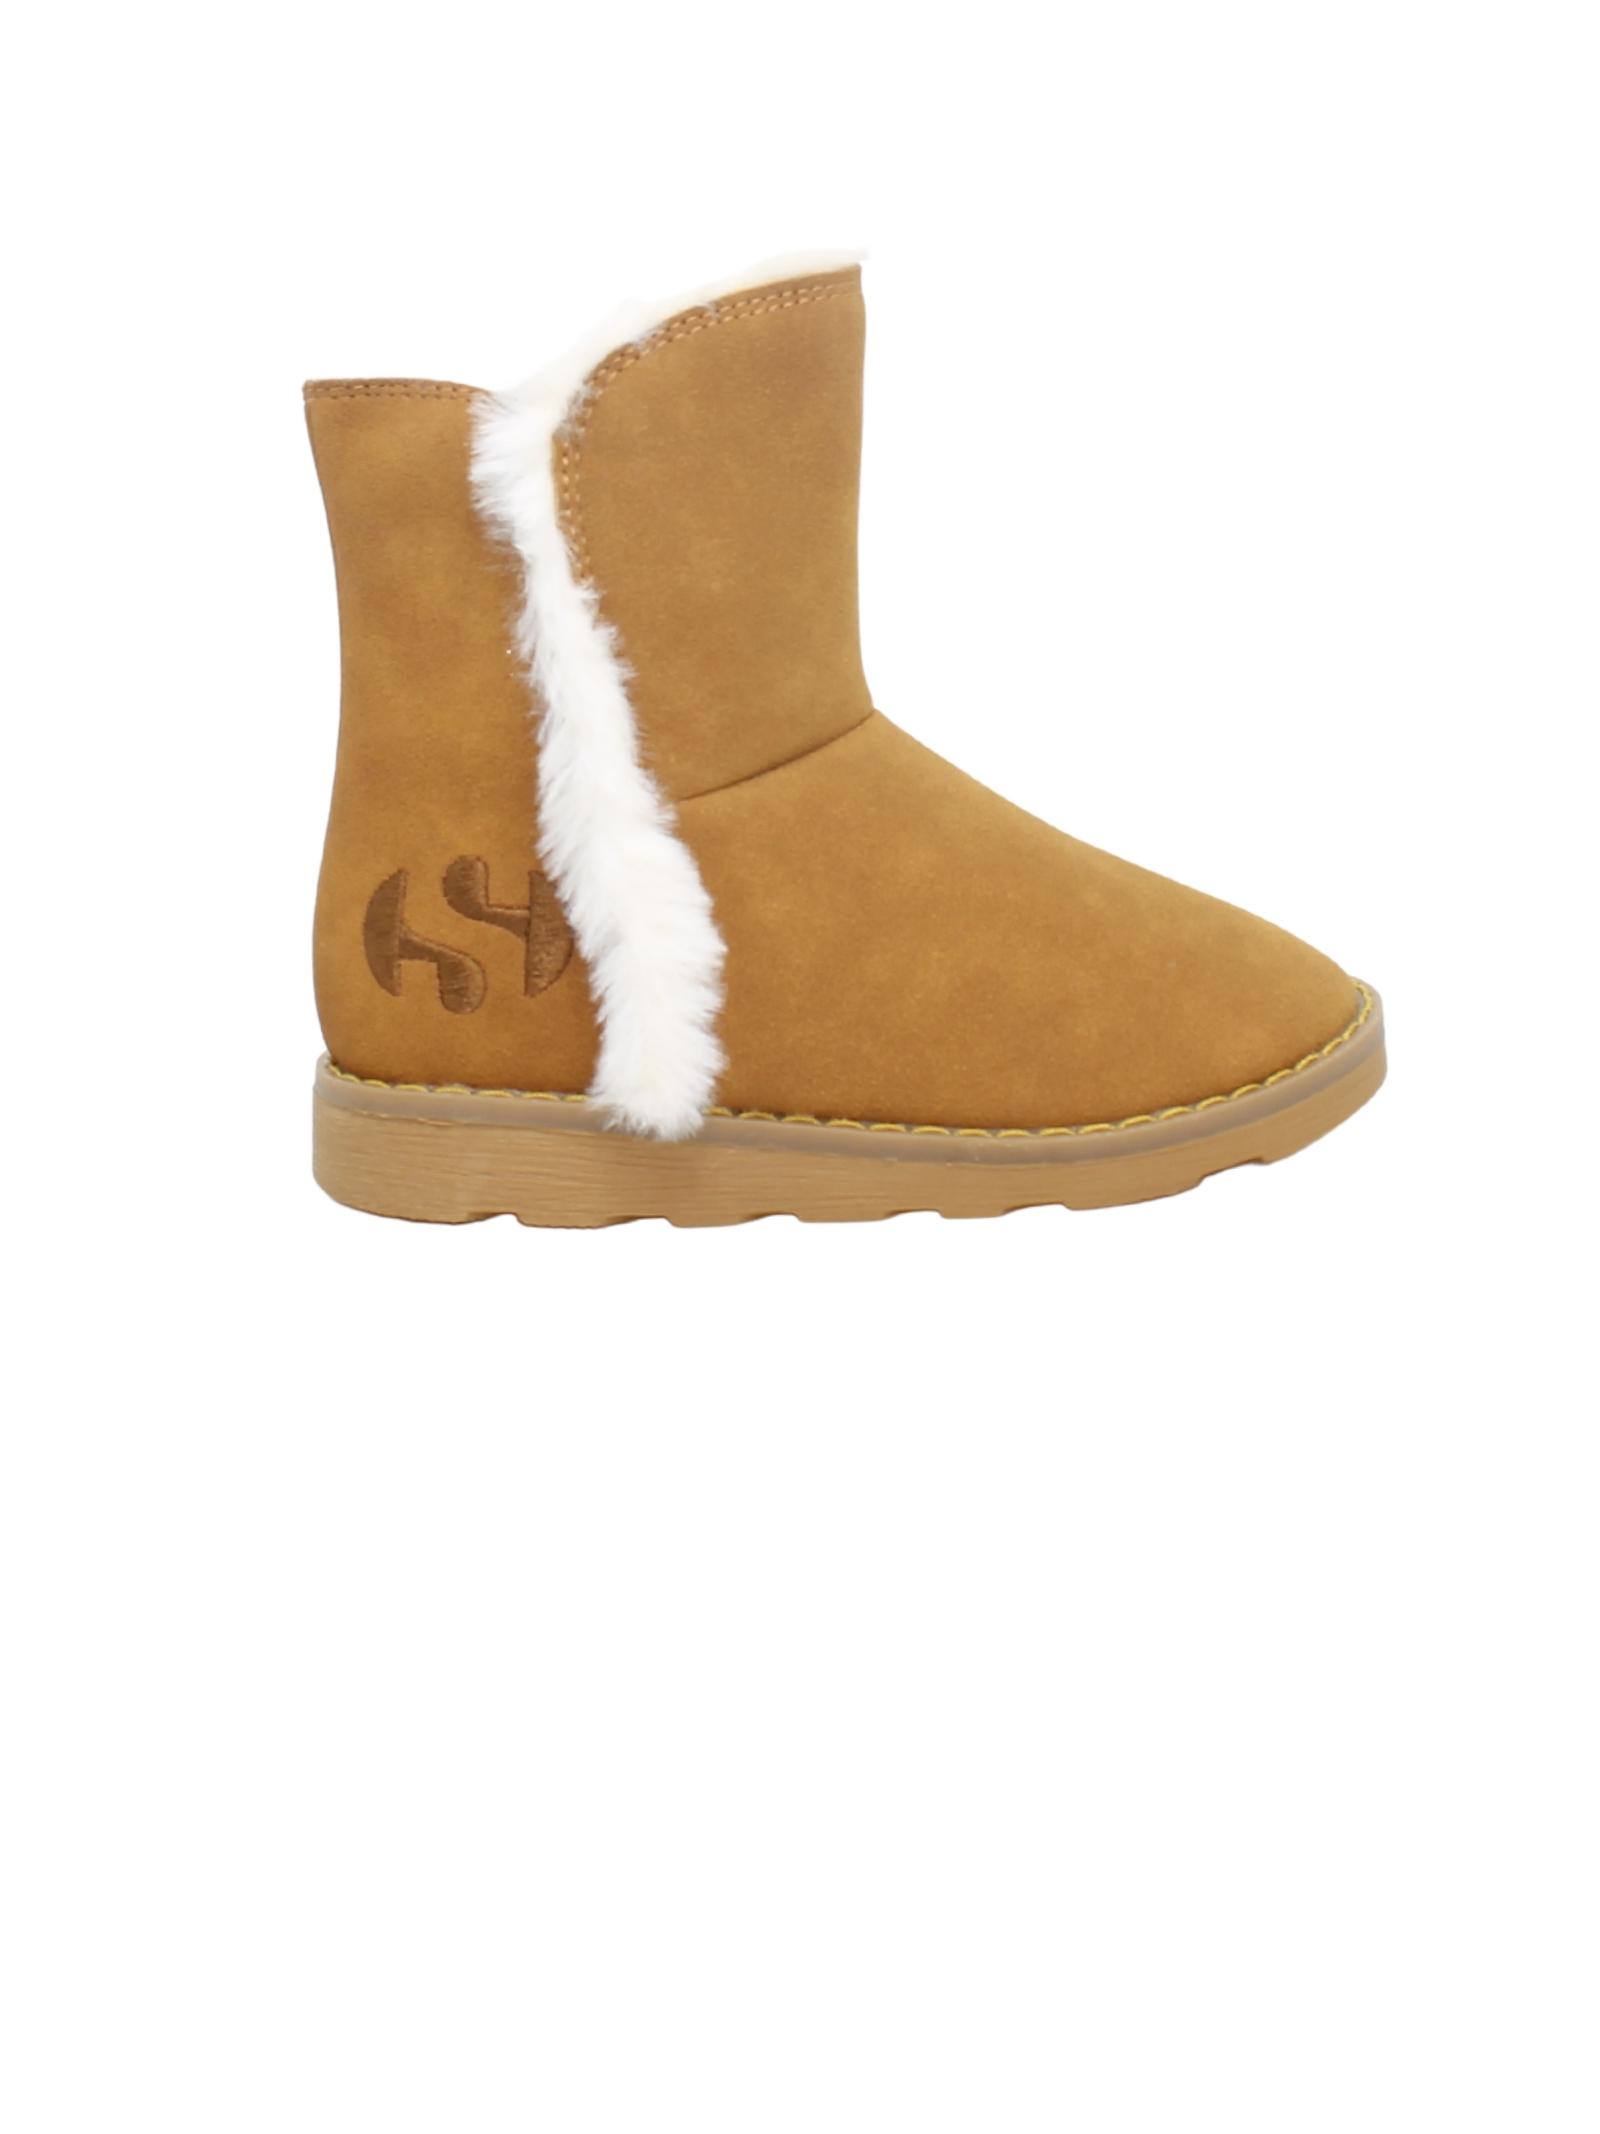 Stivali in Ecopelliccia Bambina SUPERGA KIDS | Stivali | S8111KWA18 MARRONE